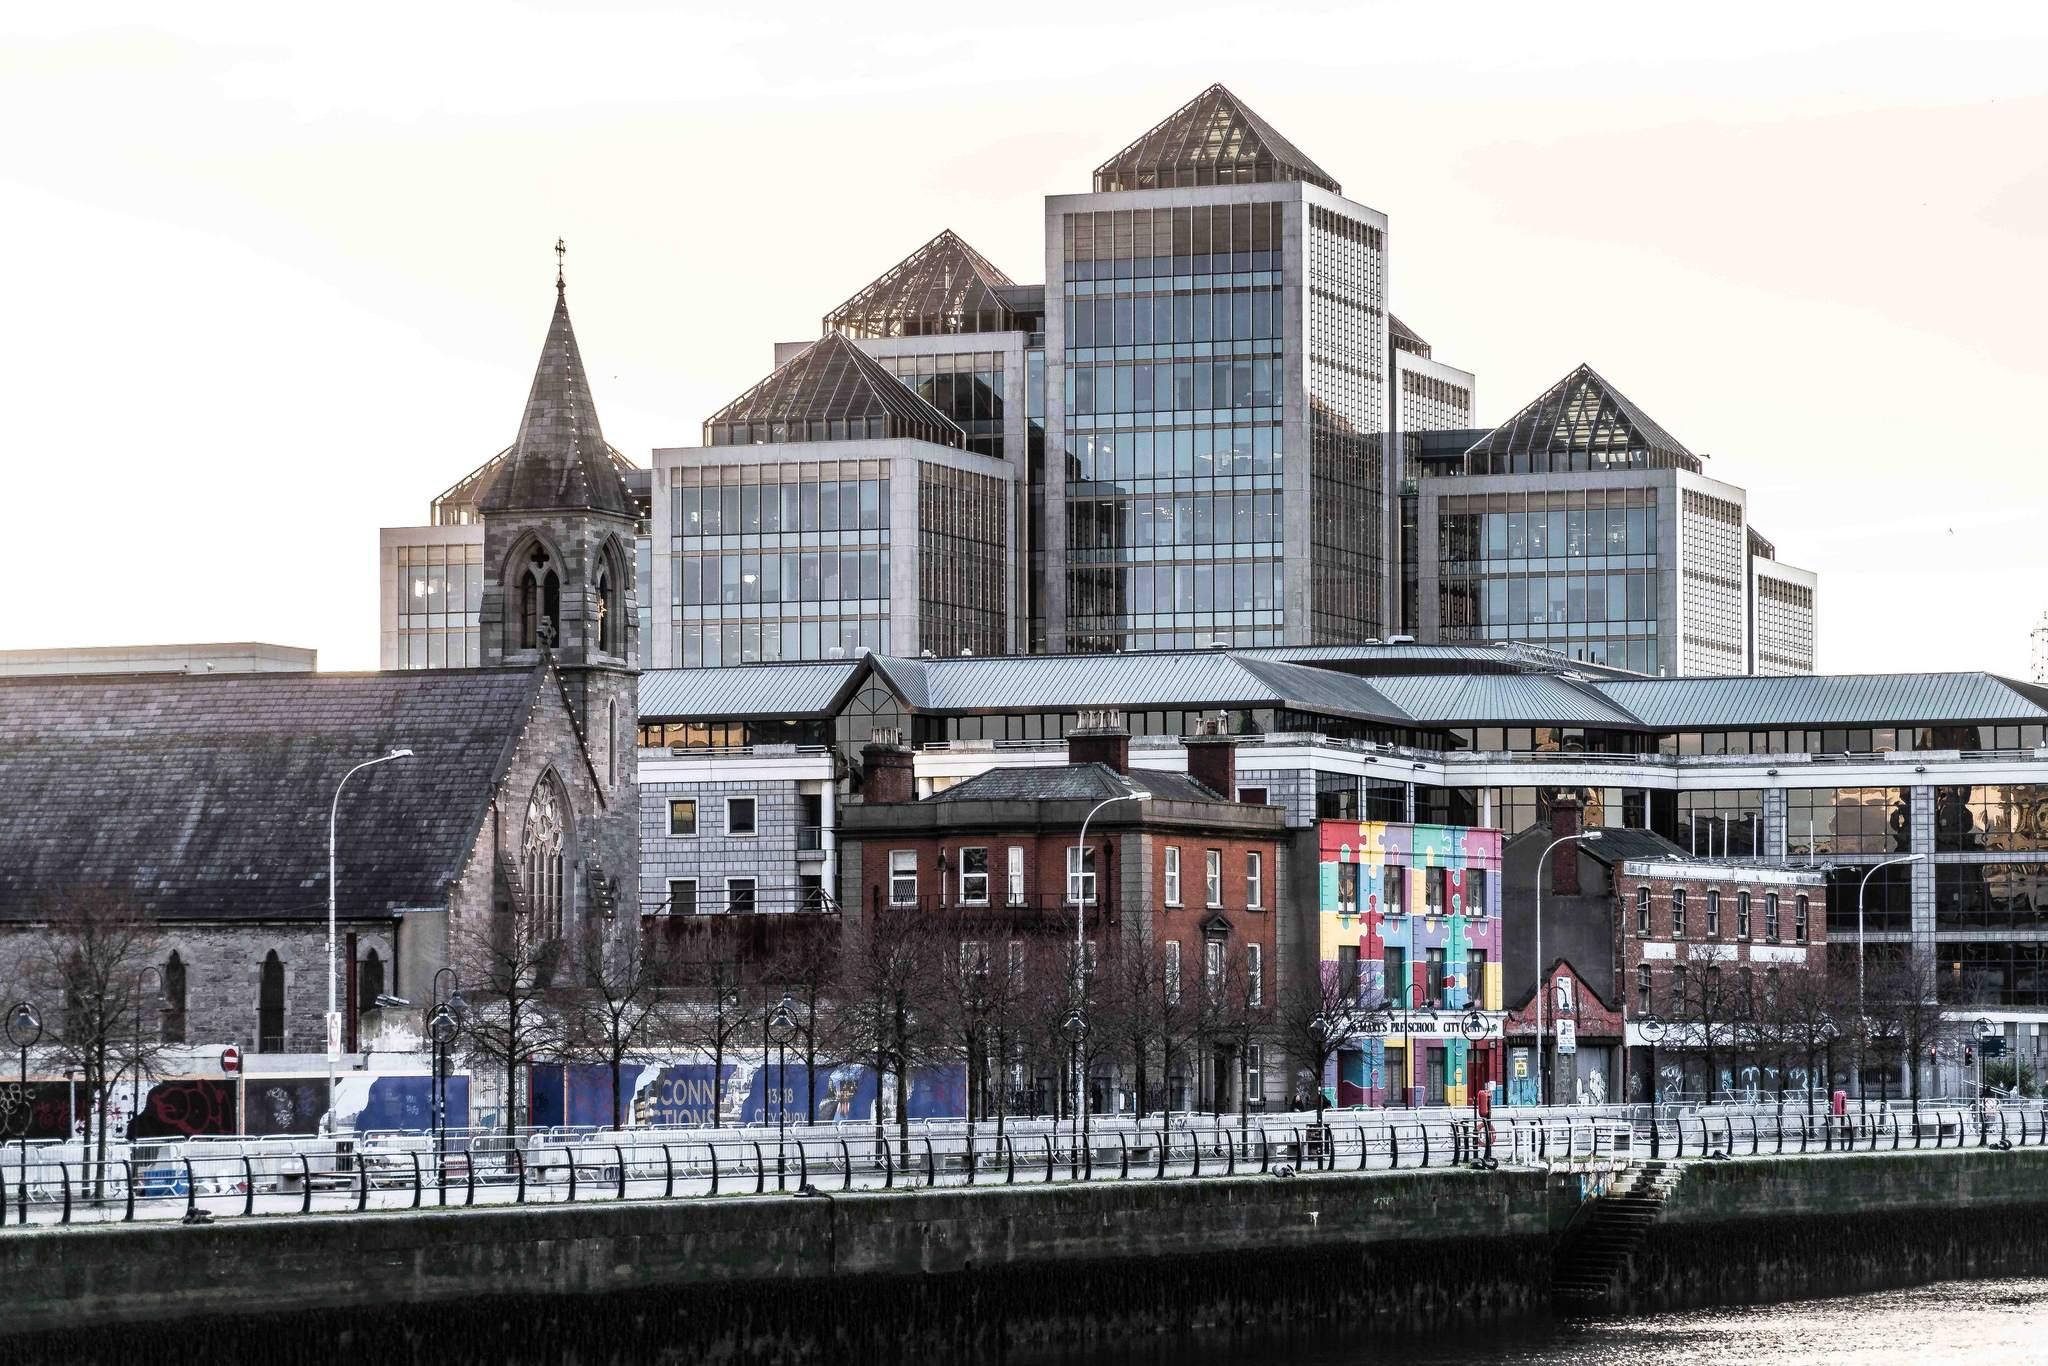 dublin docklands5 Walking Around Dublin Docklands by Marphy